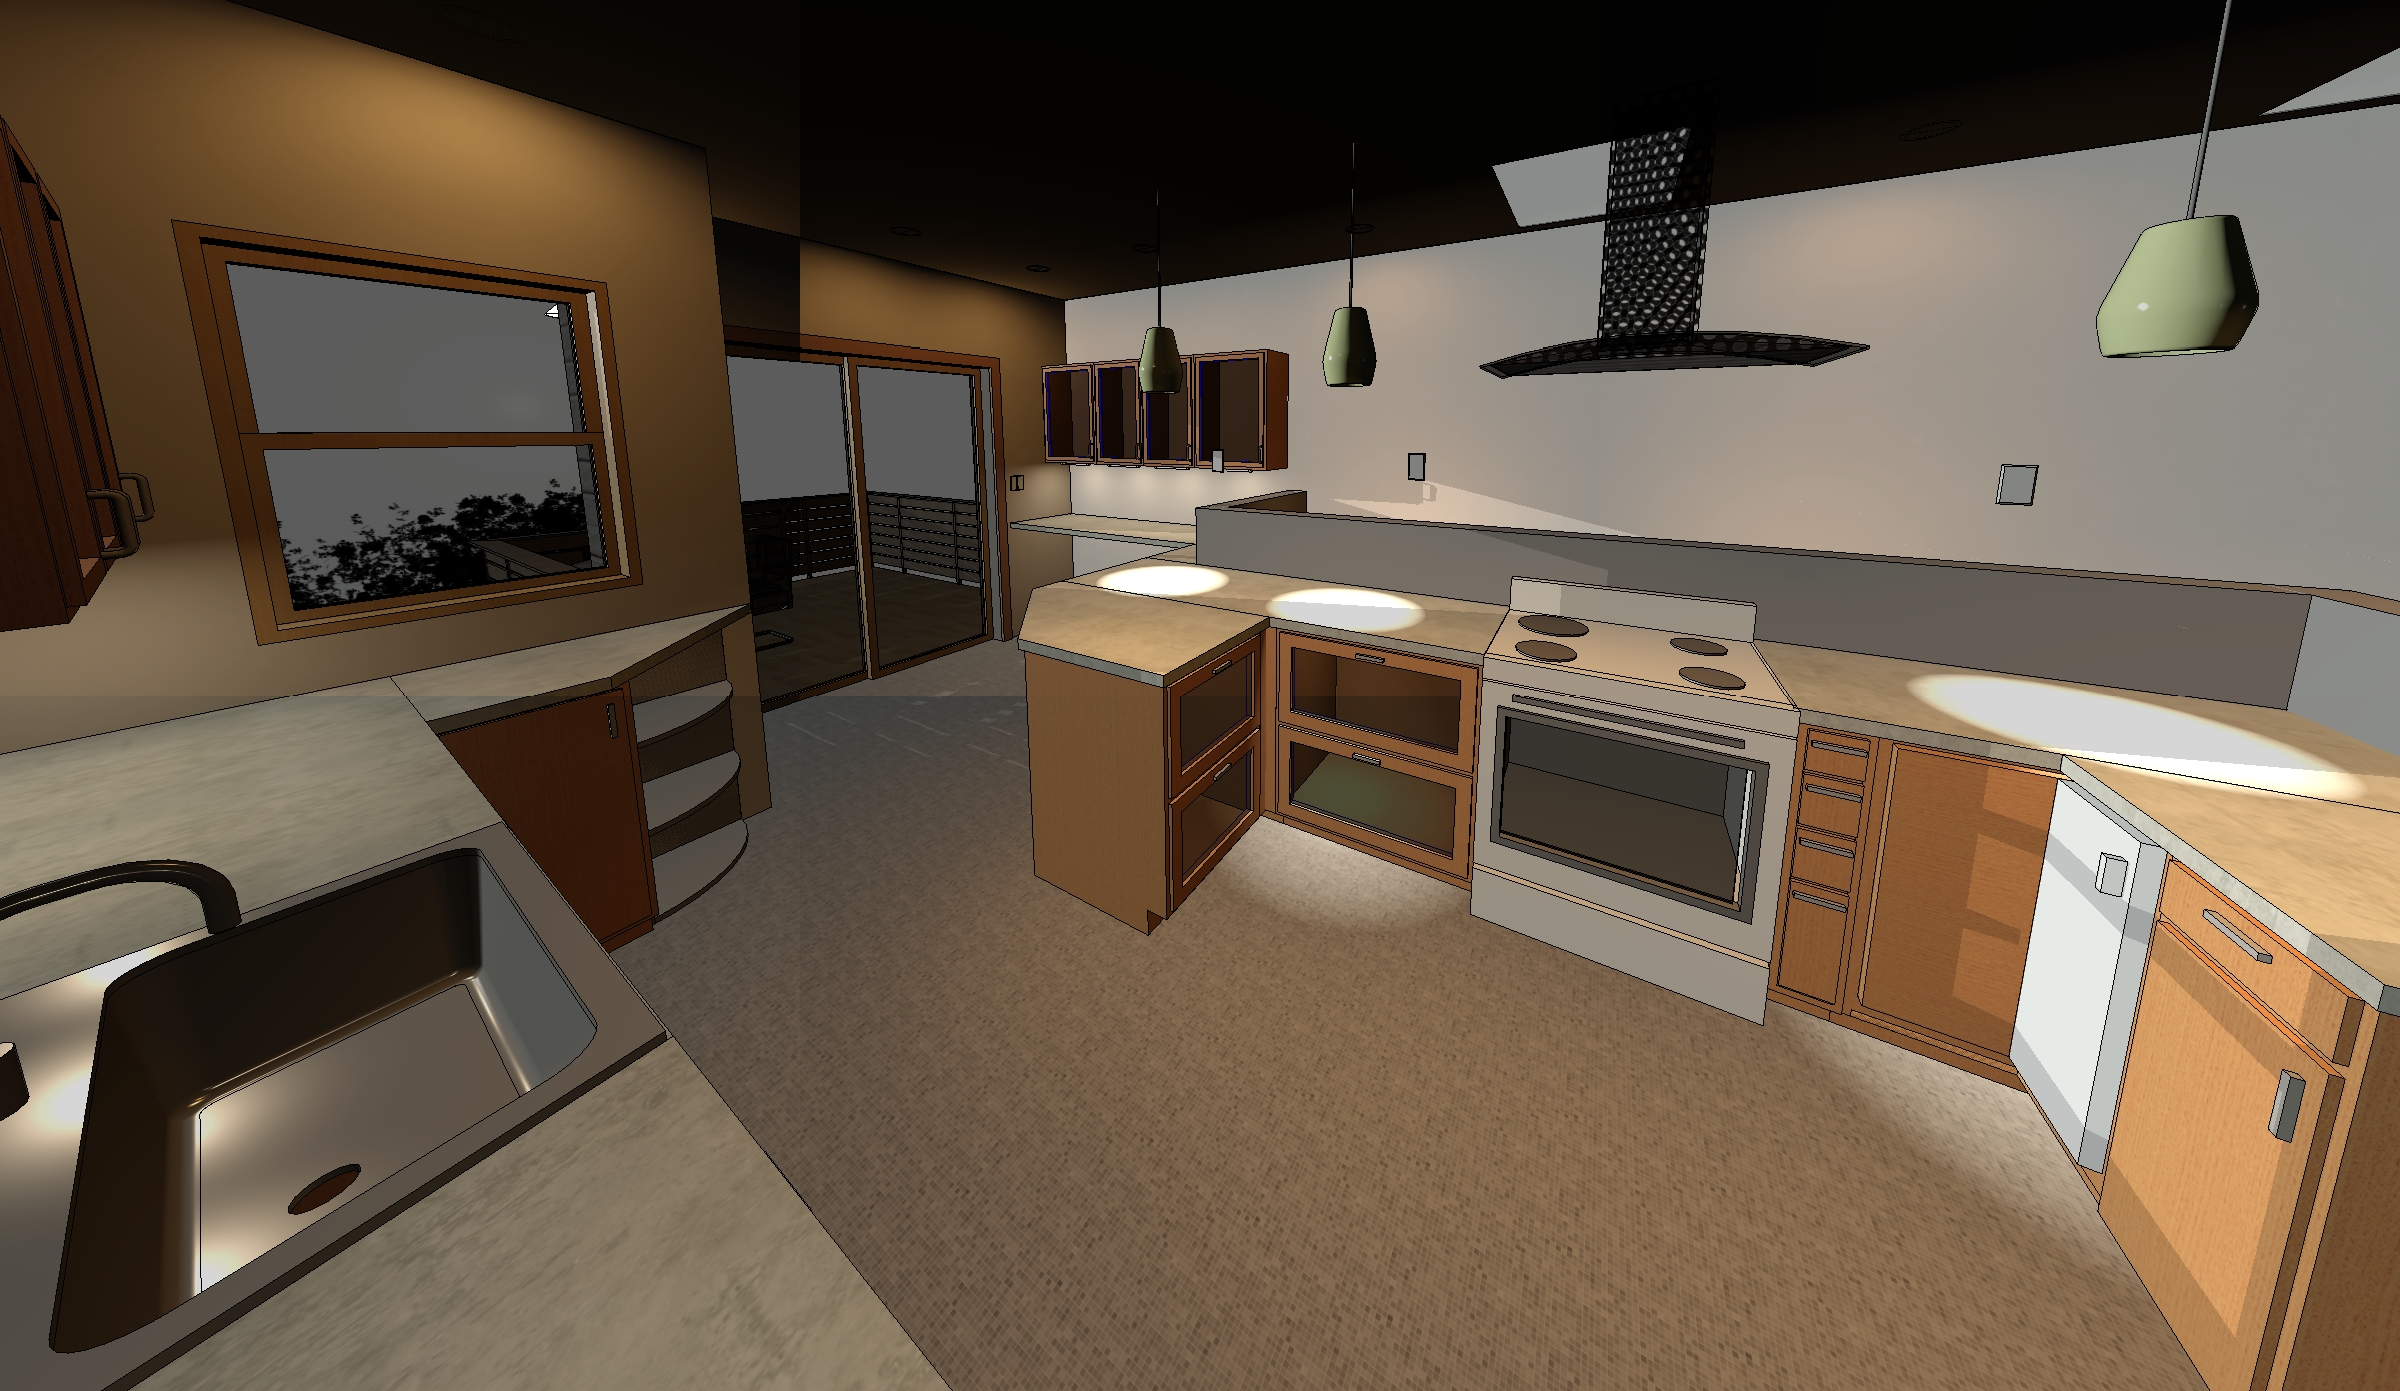 Brompton Ave. initial design stage,Revit kitchen model